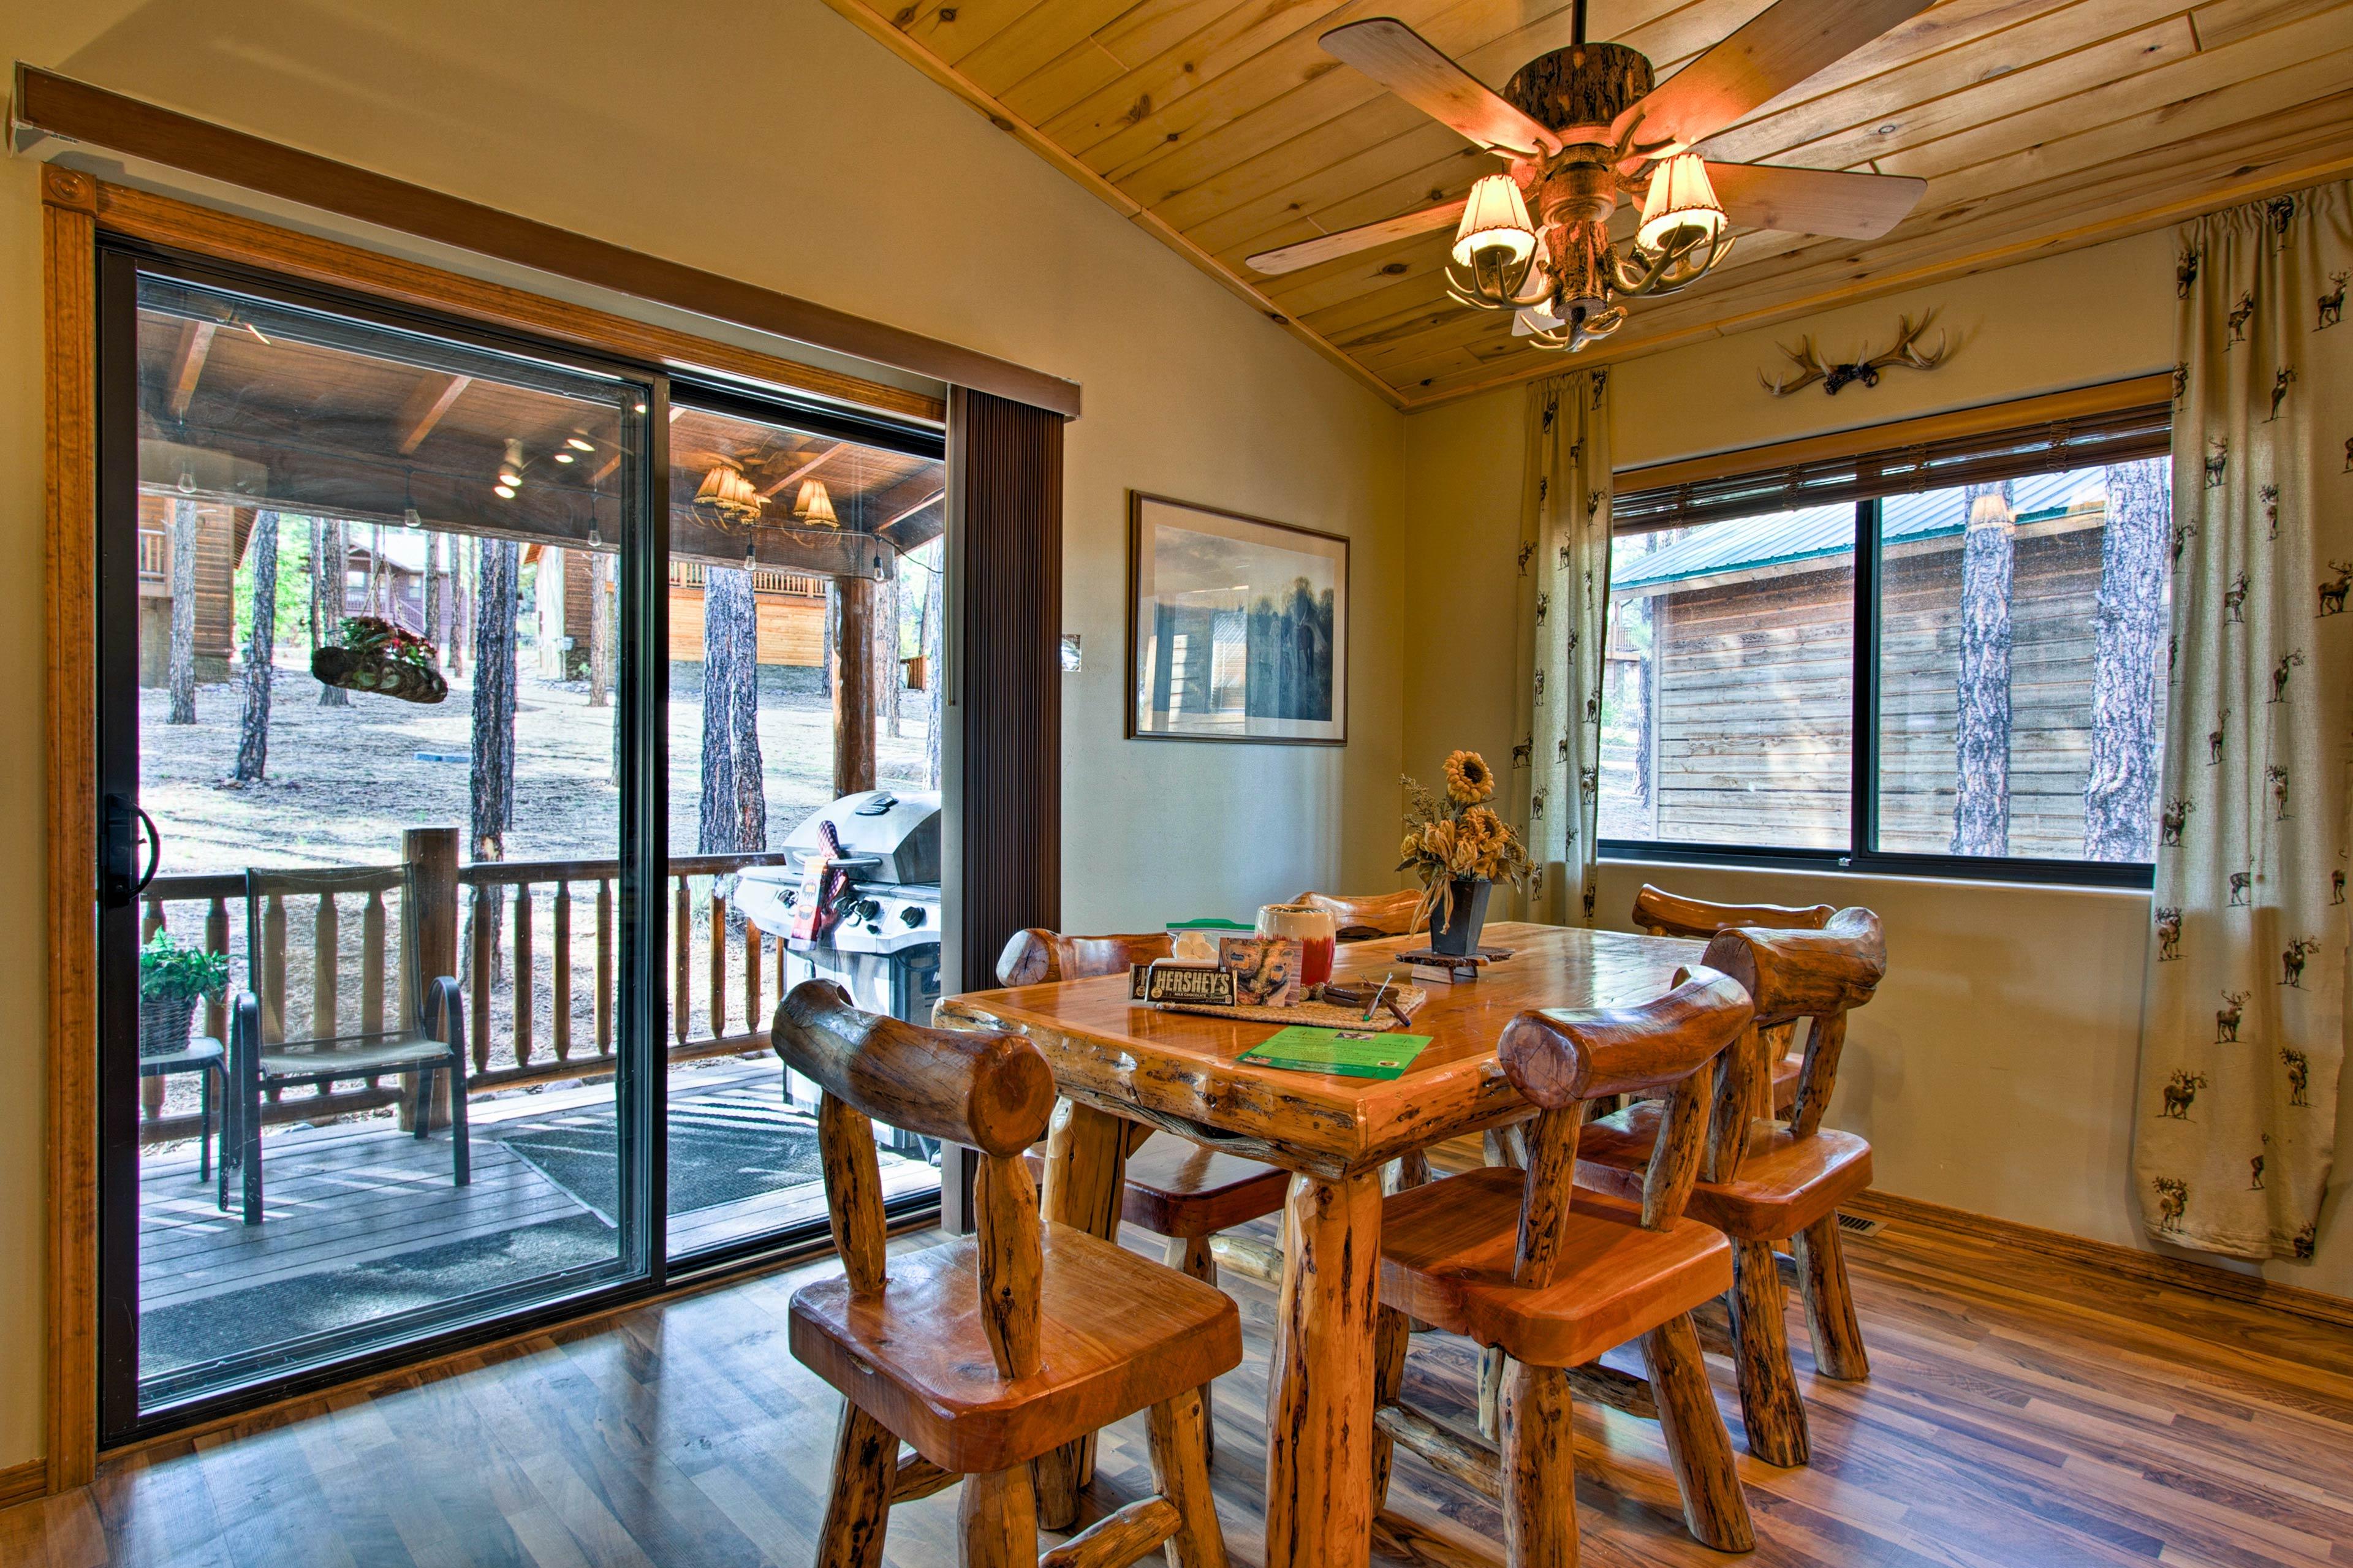 Gather around the kitchen table to enjoy meals.